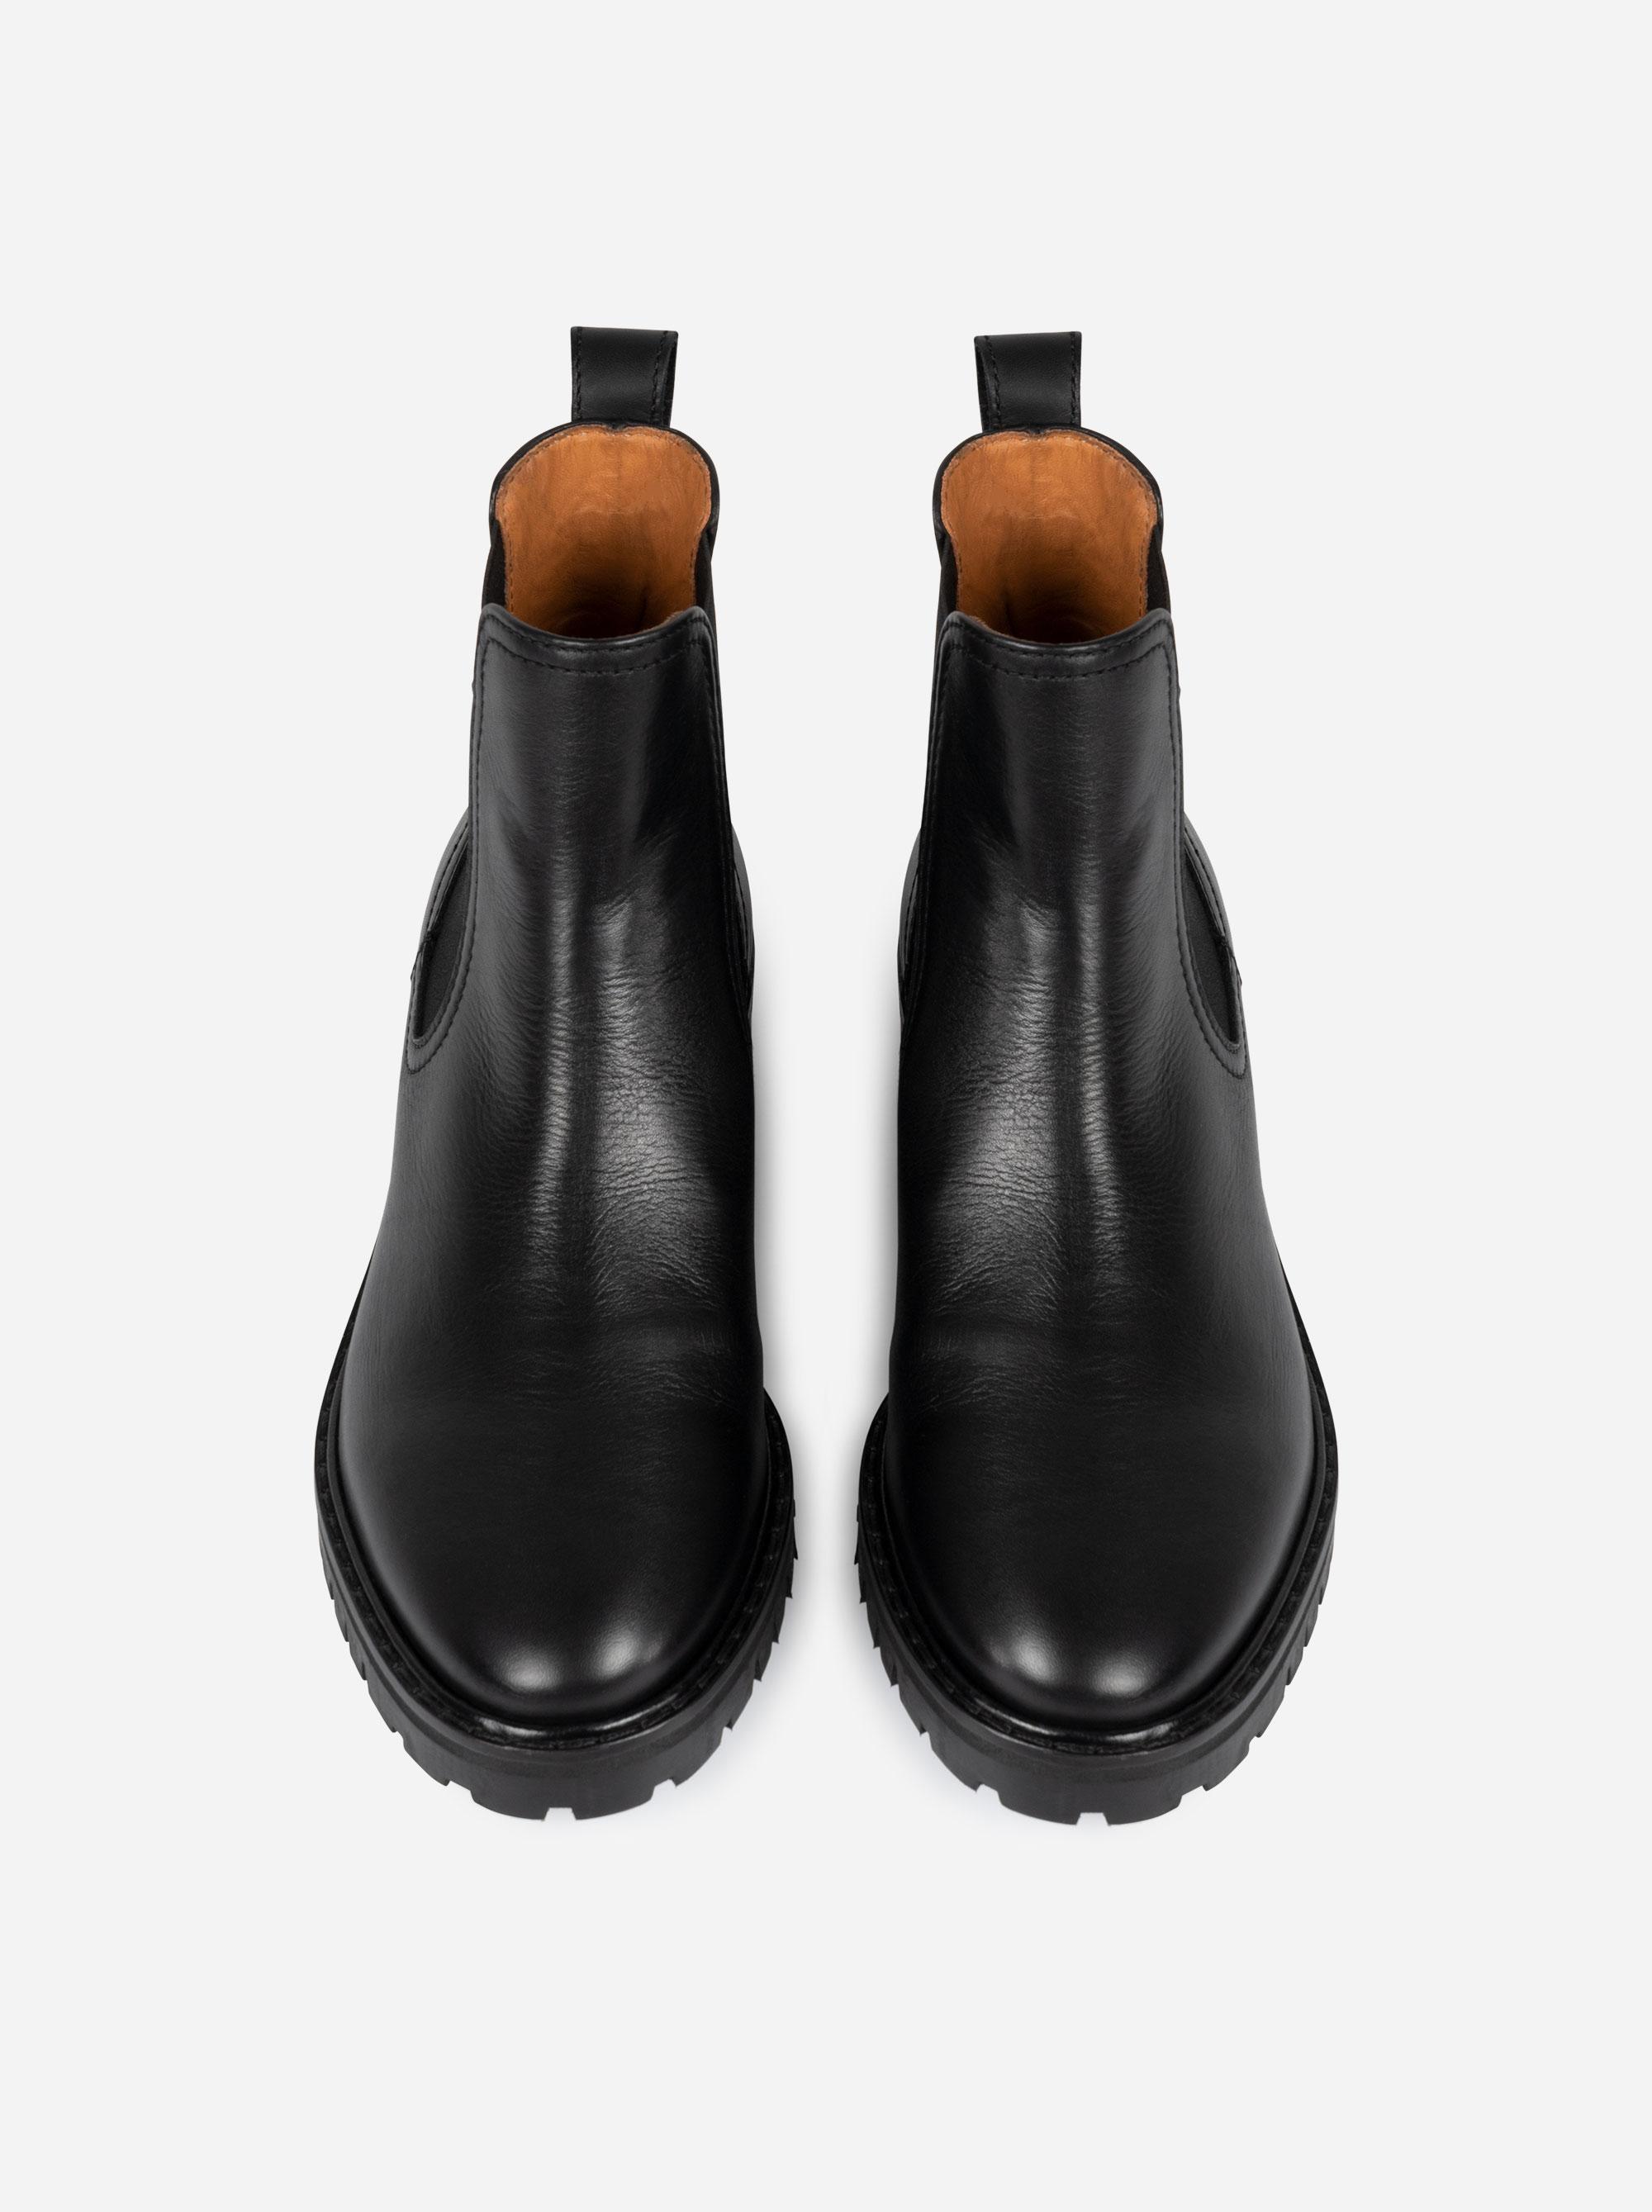 Teym - The Chelsea Boot - Black - 6